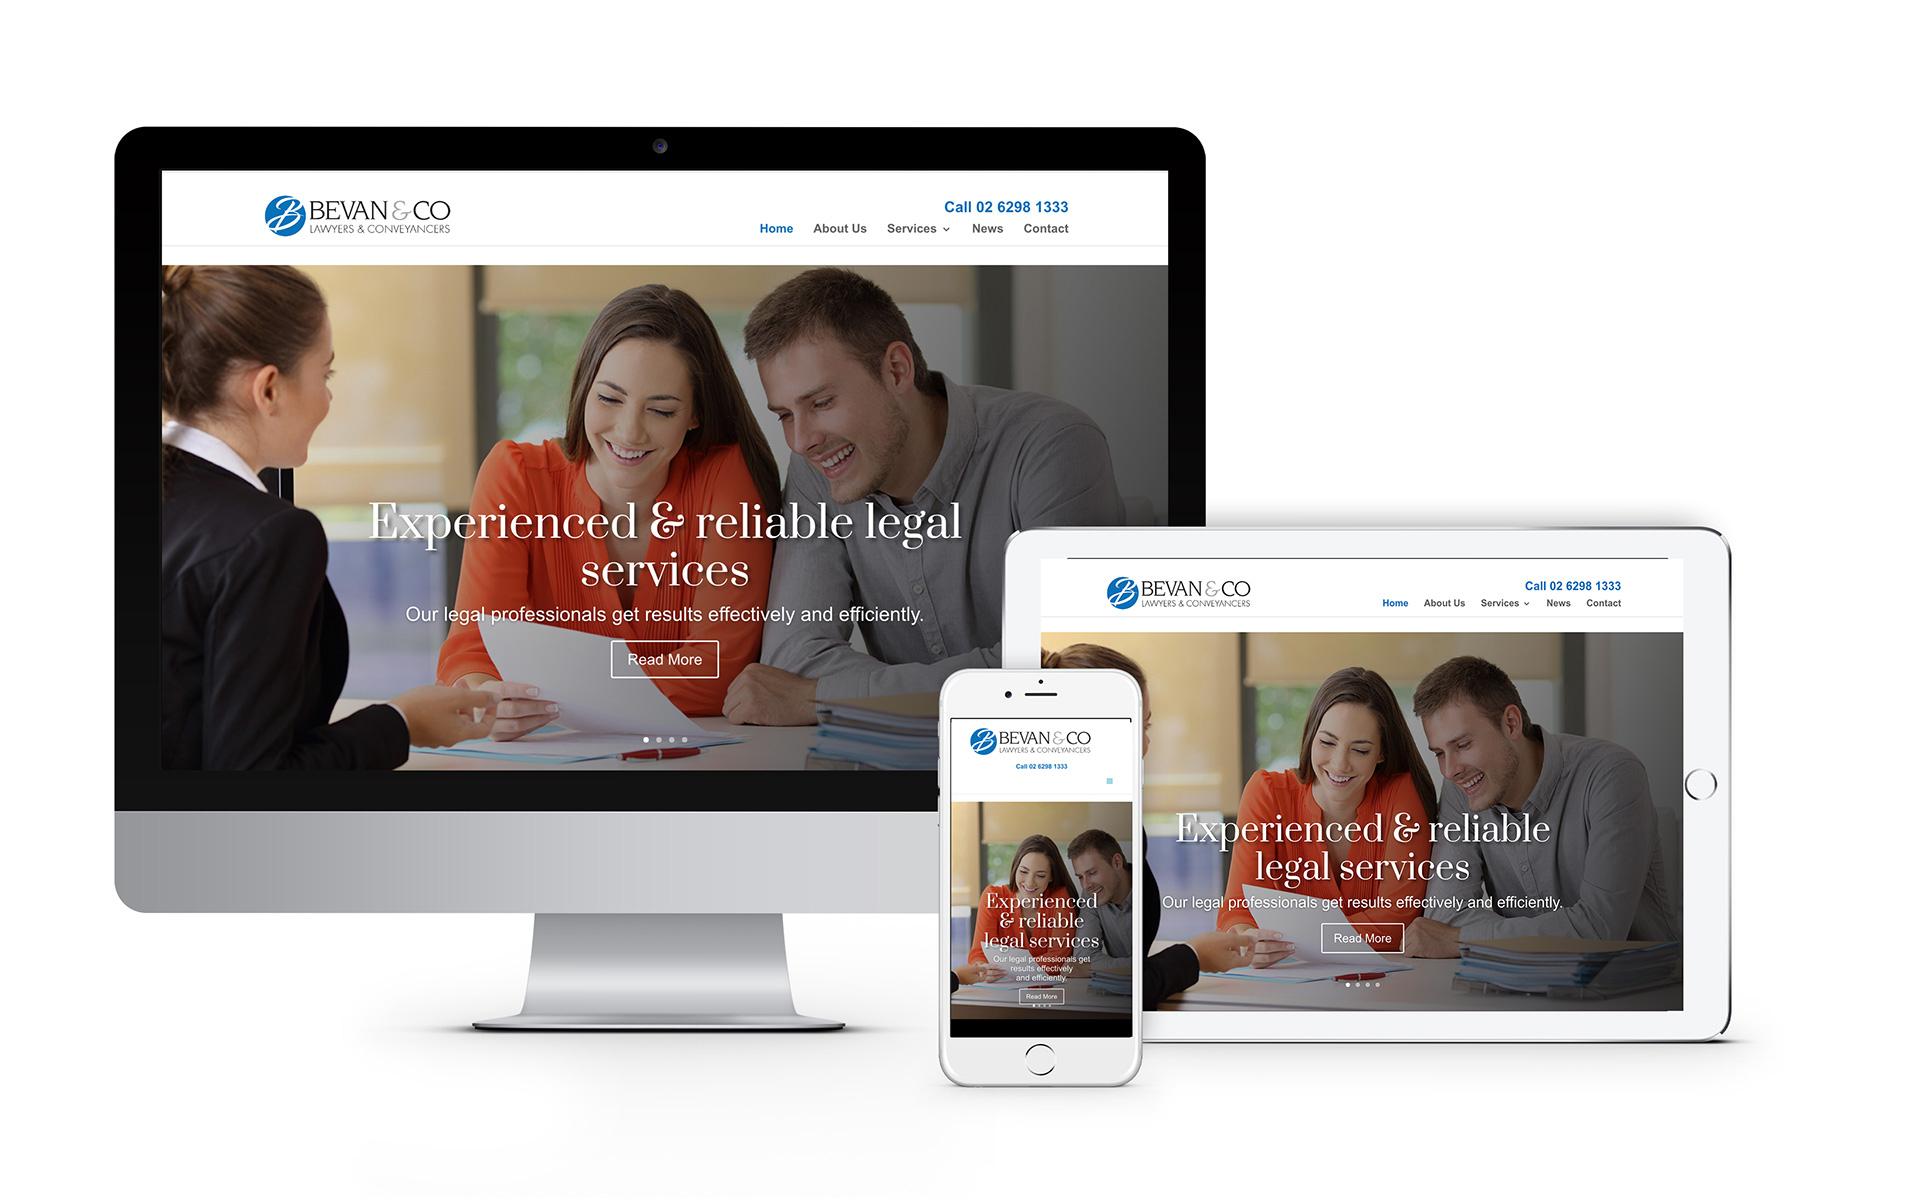 Bevan and Co Queanbeyan Lawyers Website Designed 2020